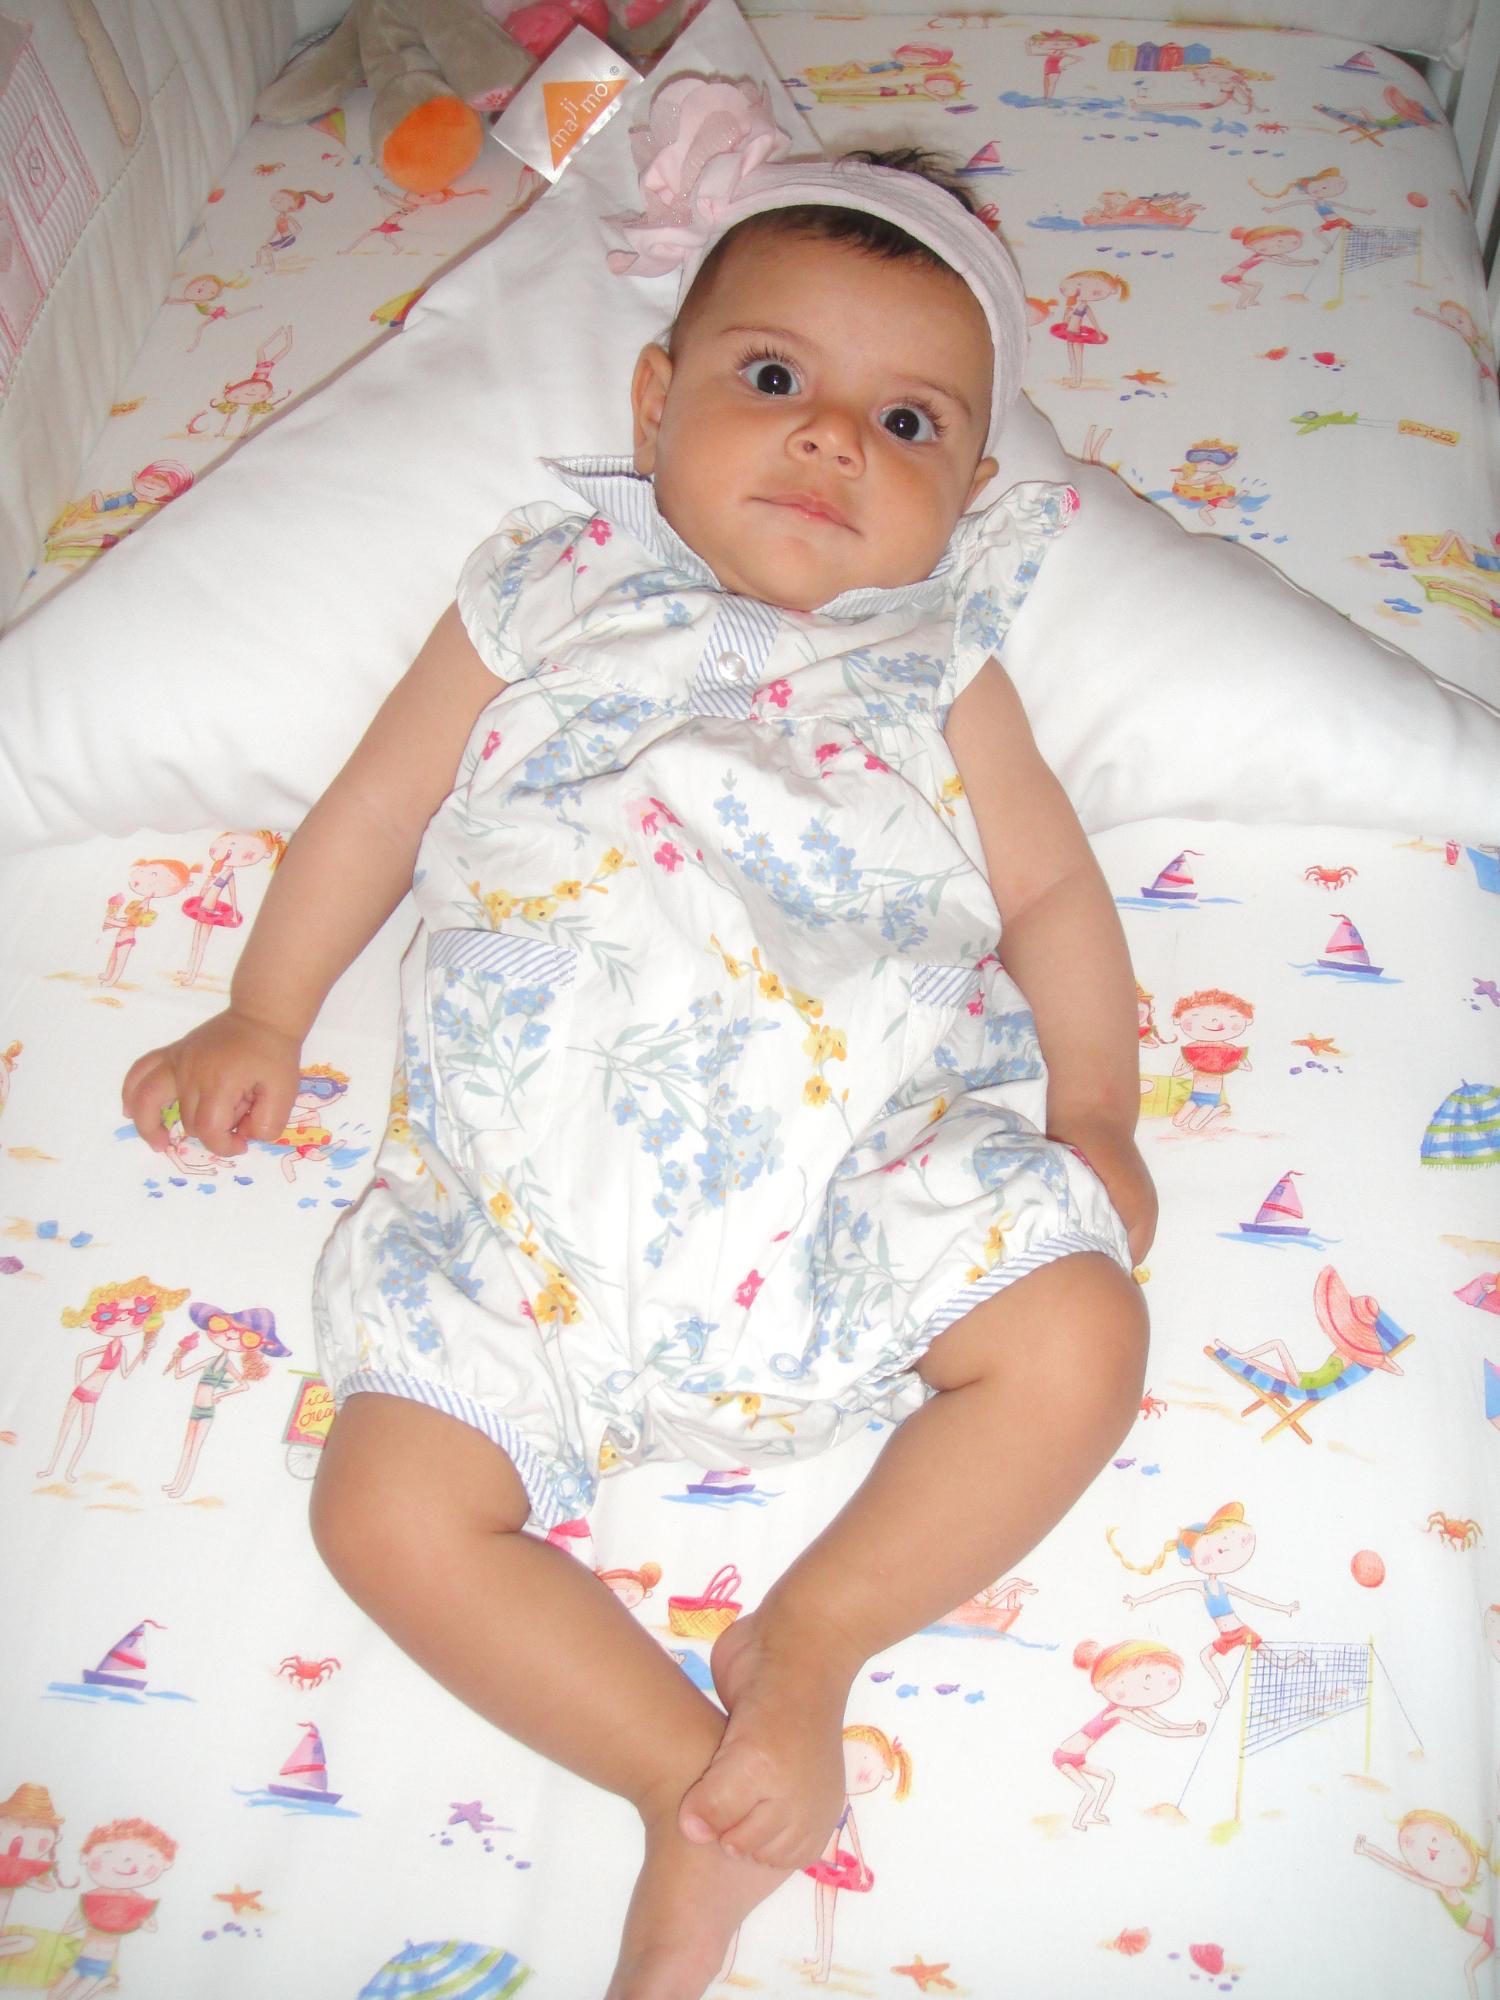 gr xl majimo dreiklang schwangerschaft kissen set mit und ohne rei verschluss 9 teilig. Black Bedroom Furniture Sets. Home Design Ideas